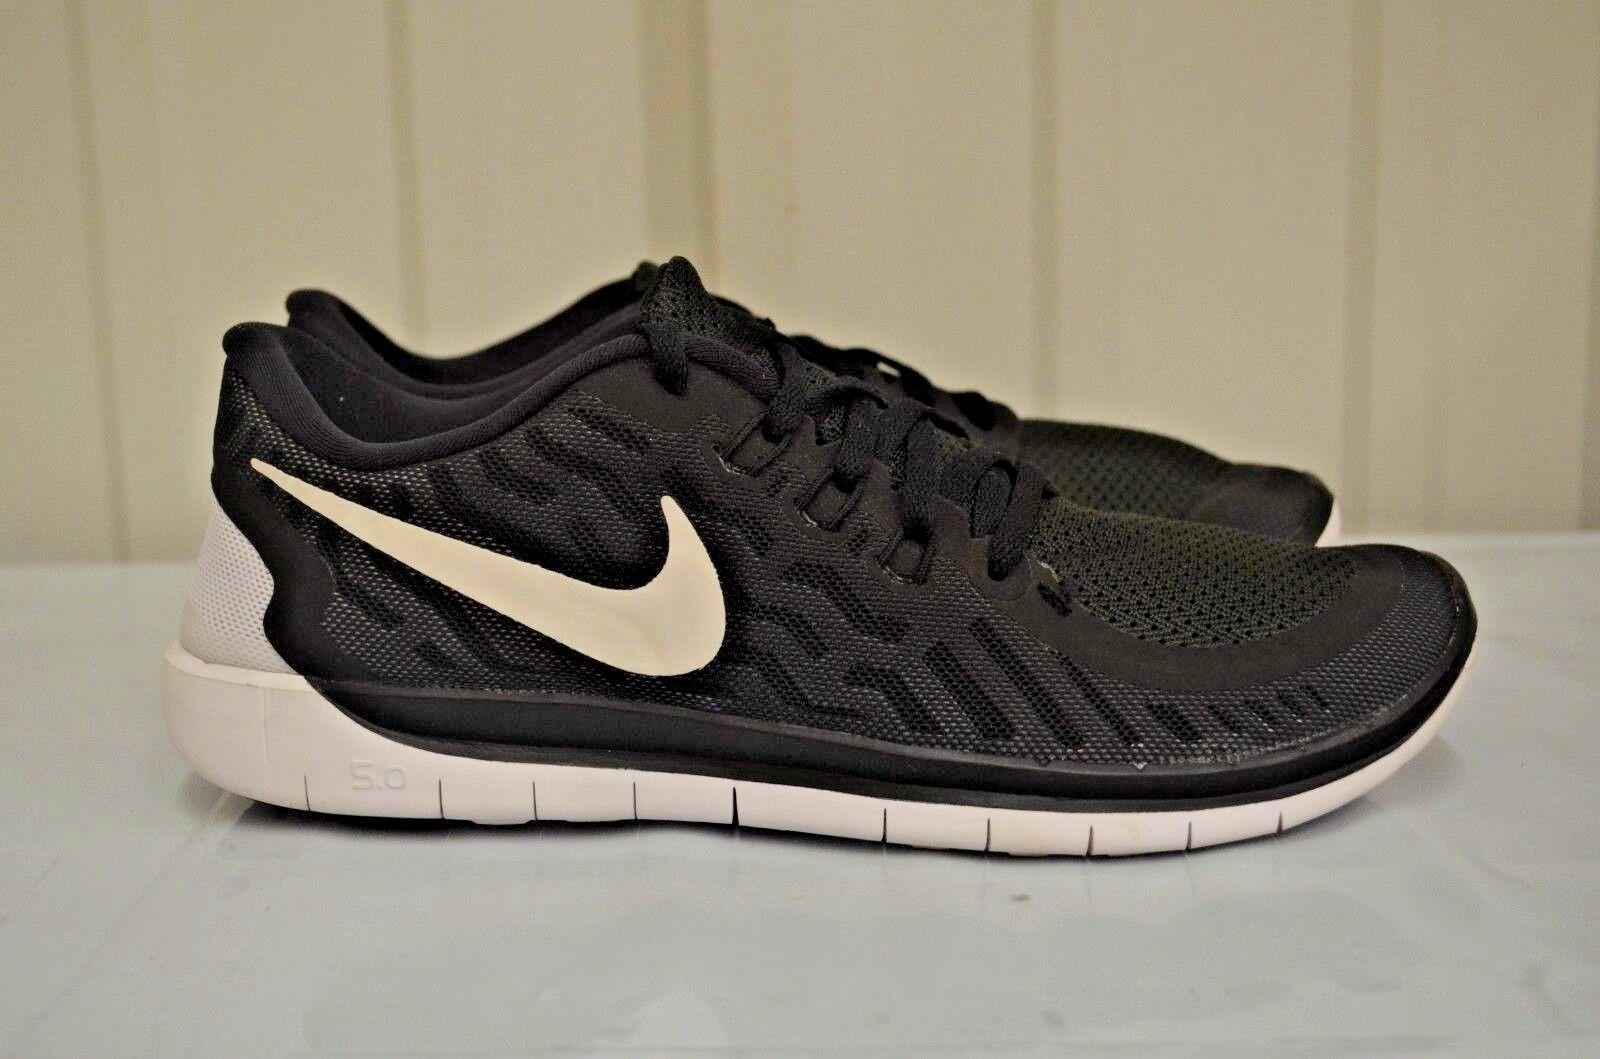 pretty nice 1b5cd 06360 Nike 5.0 GS Big Kids 725104-001 Black Grey Athletic Shoes Youth Size 7    eBay